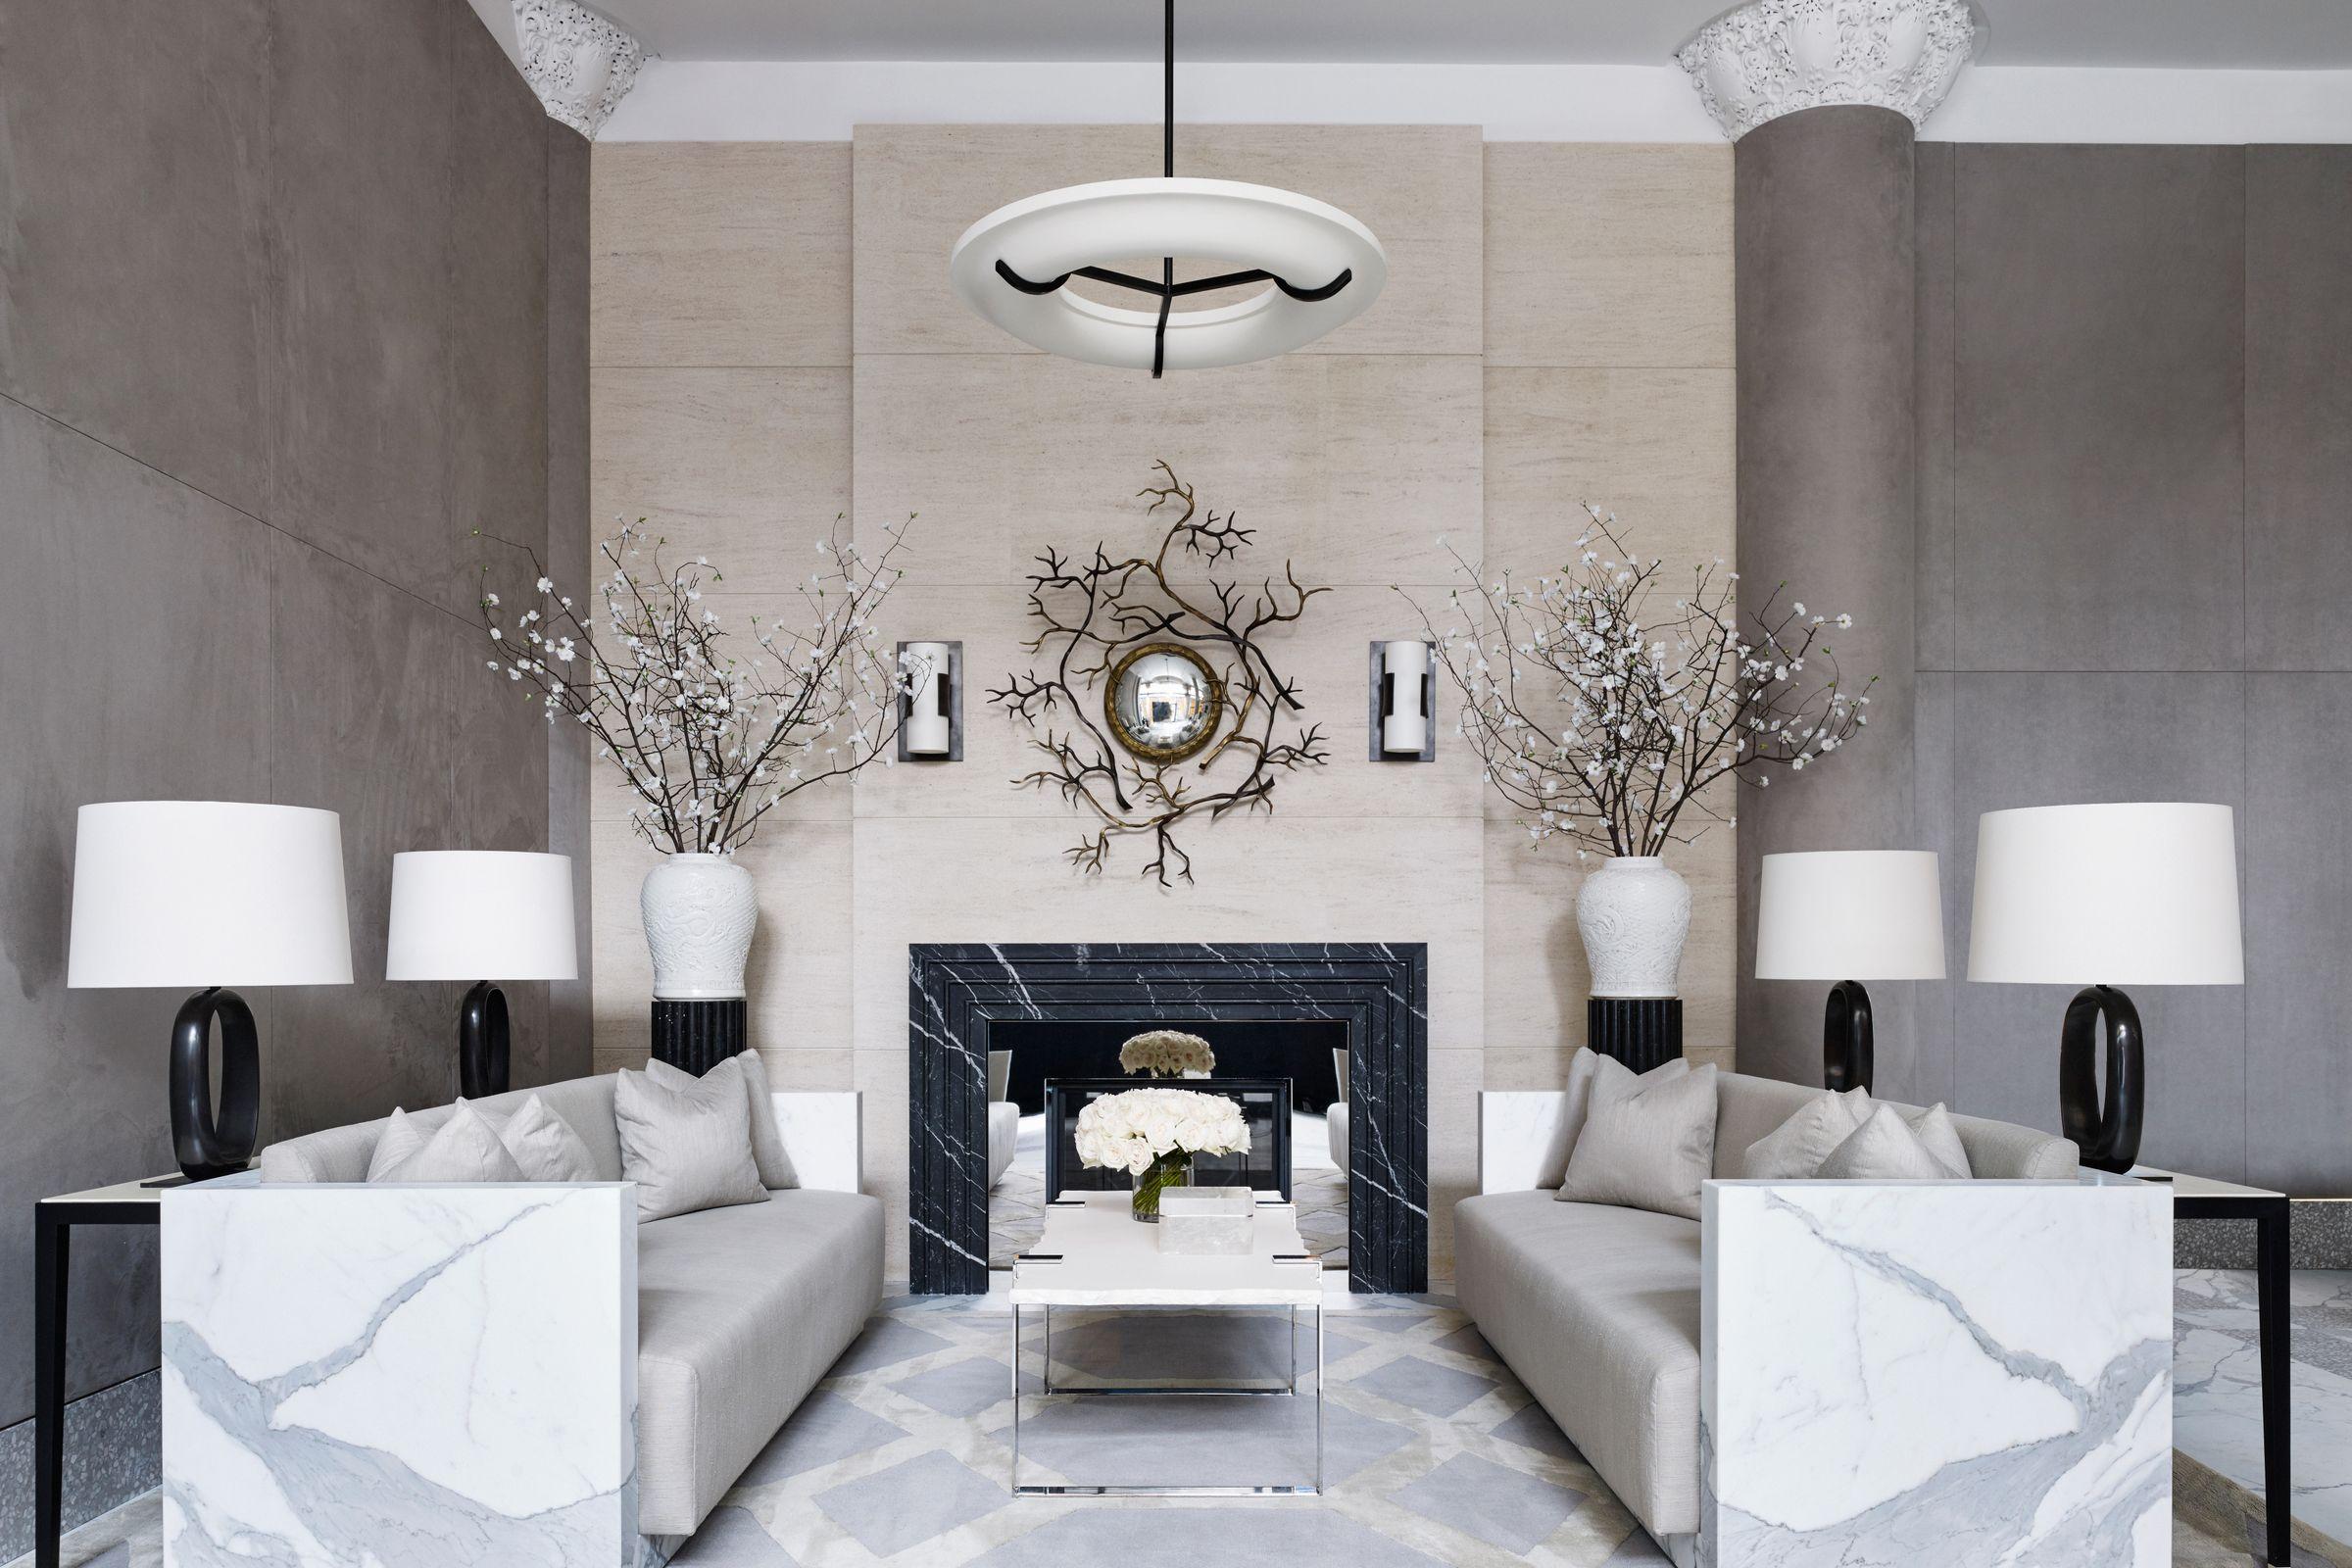 40 Bleecker lobby by Ryan Korban interior photography